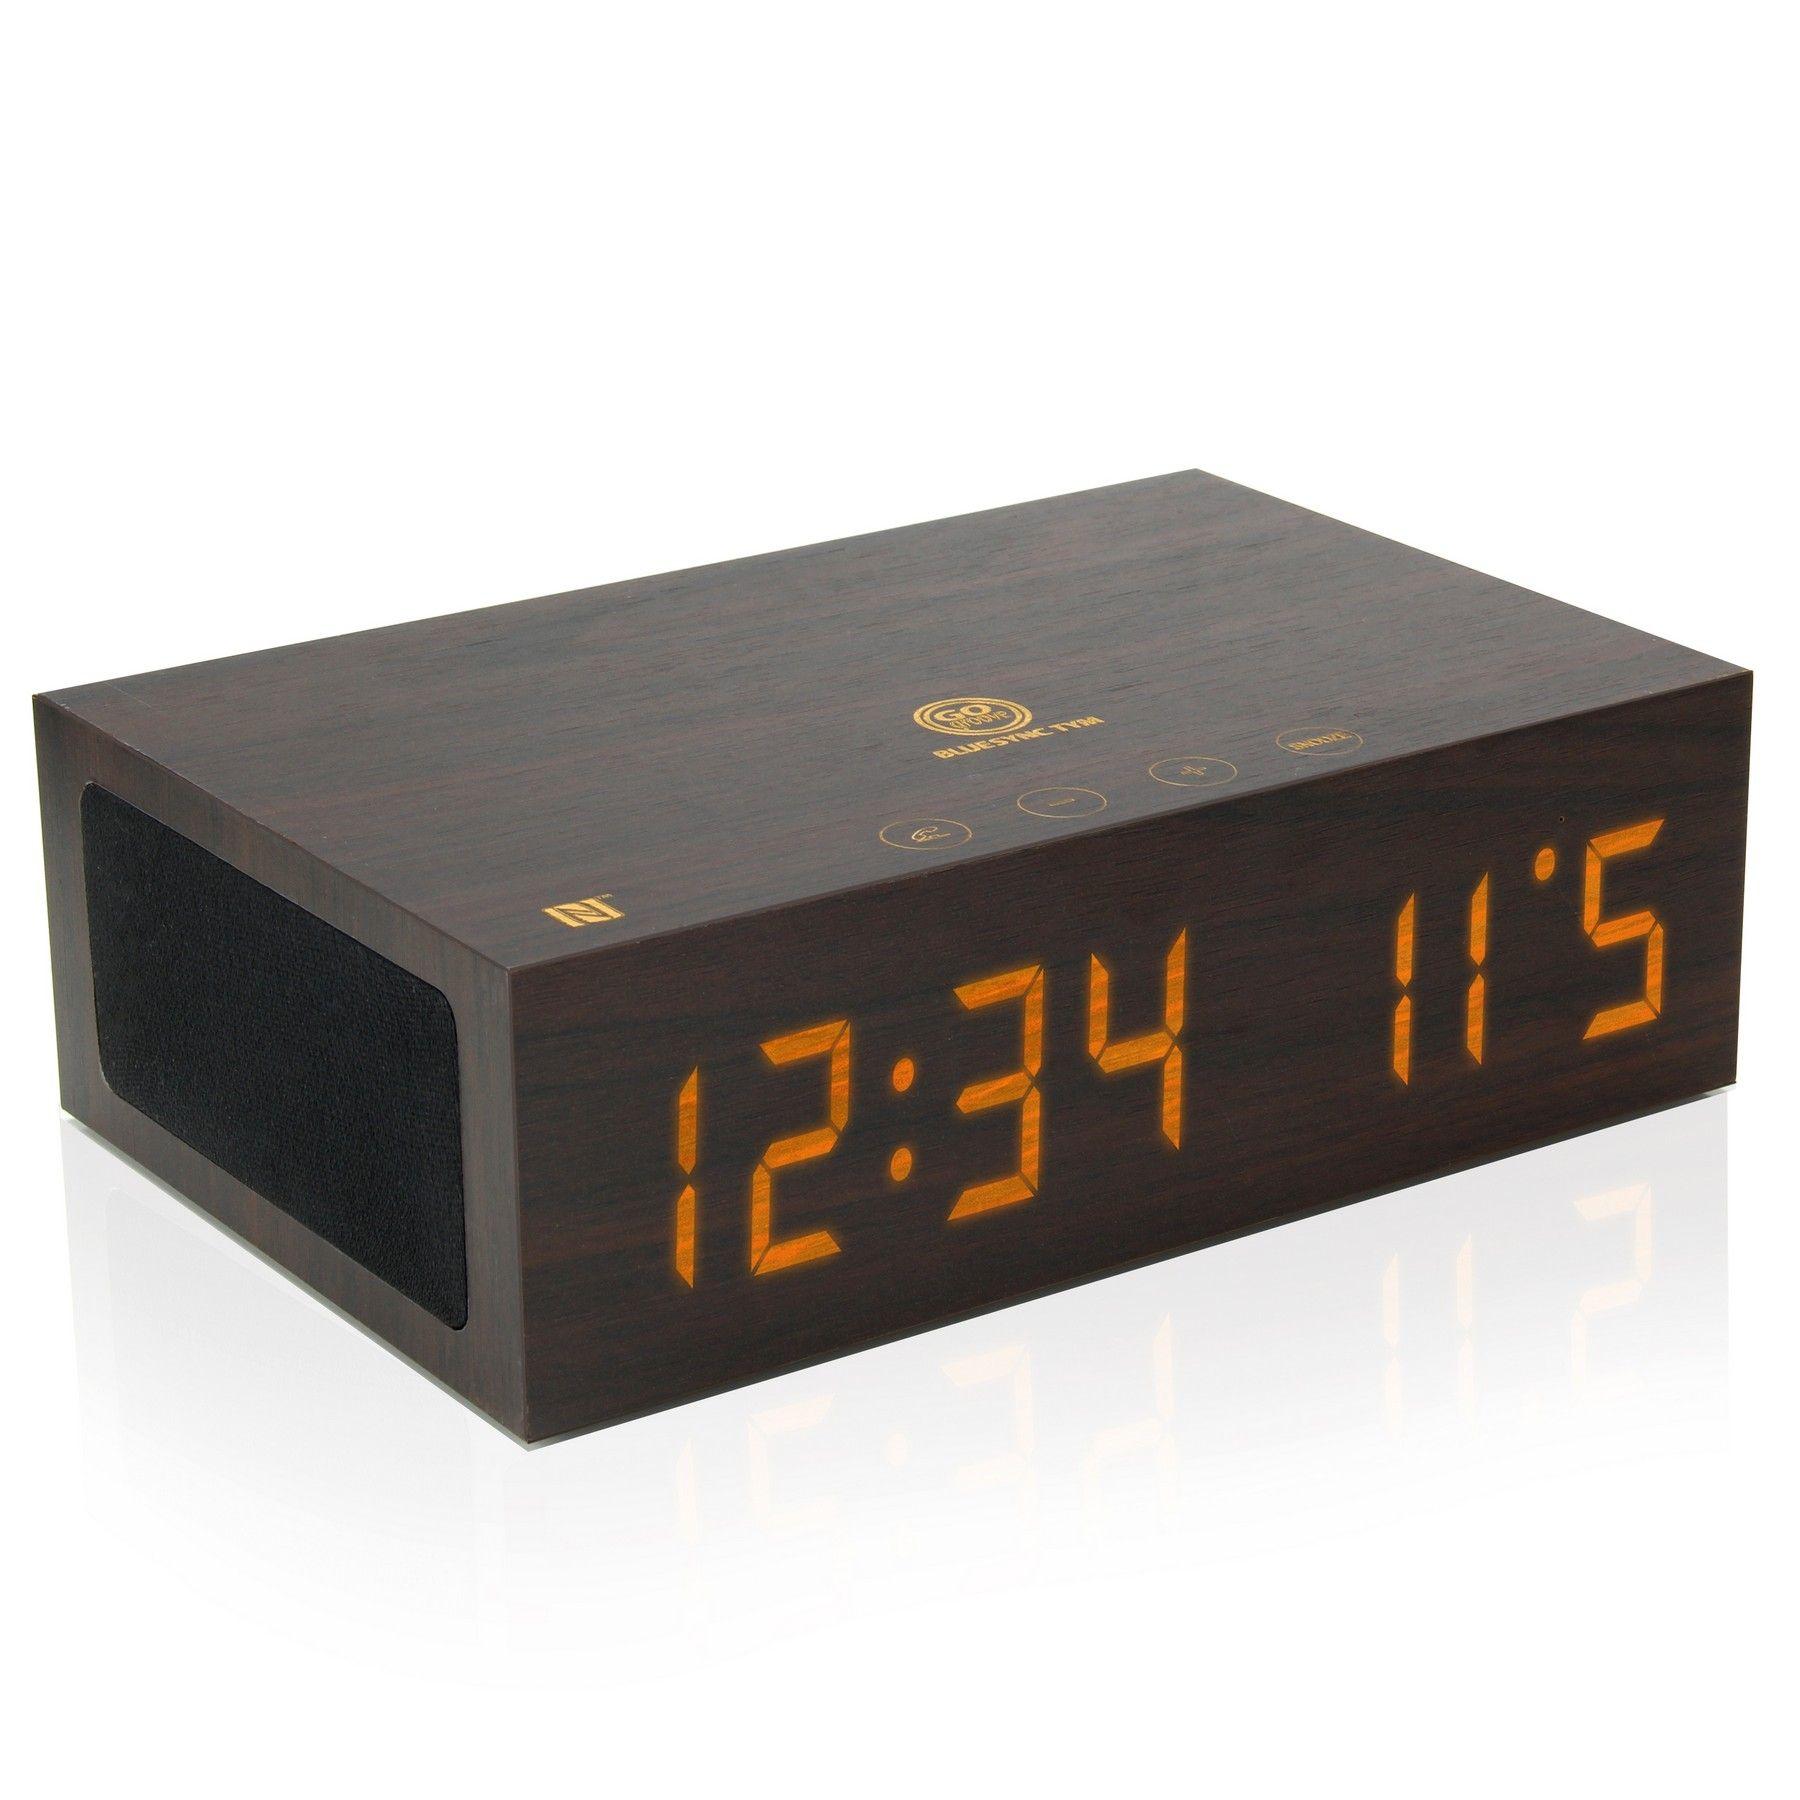 bs-alarm-clock-gg-1011.jpg